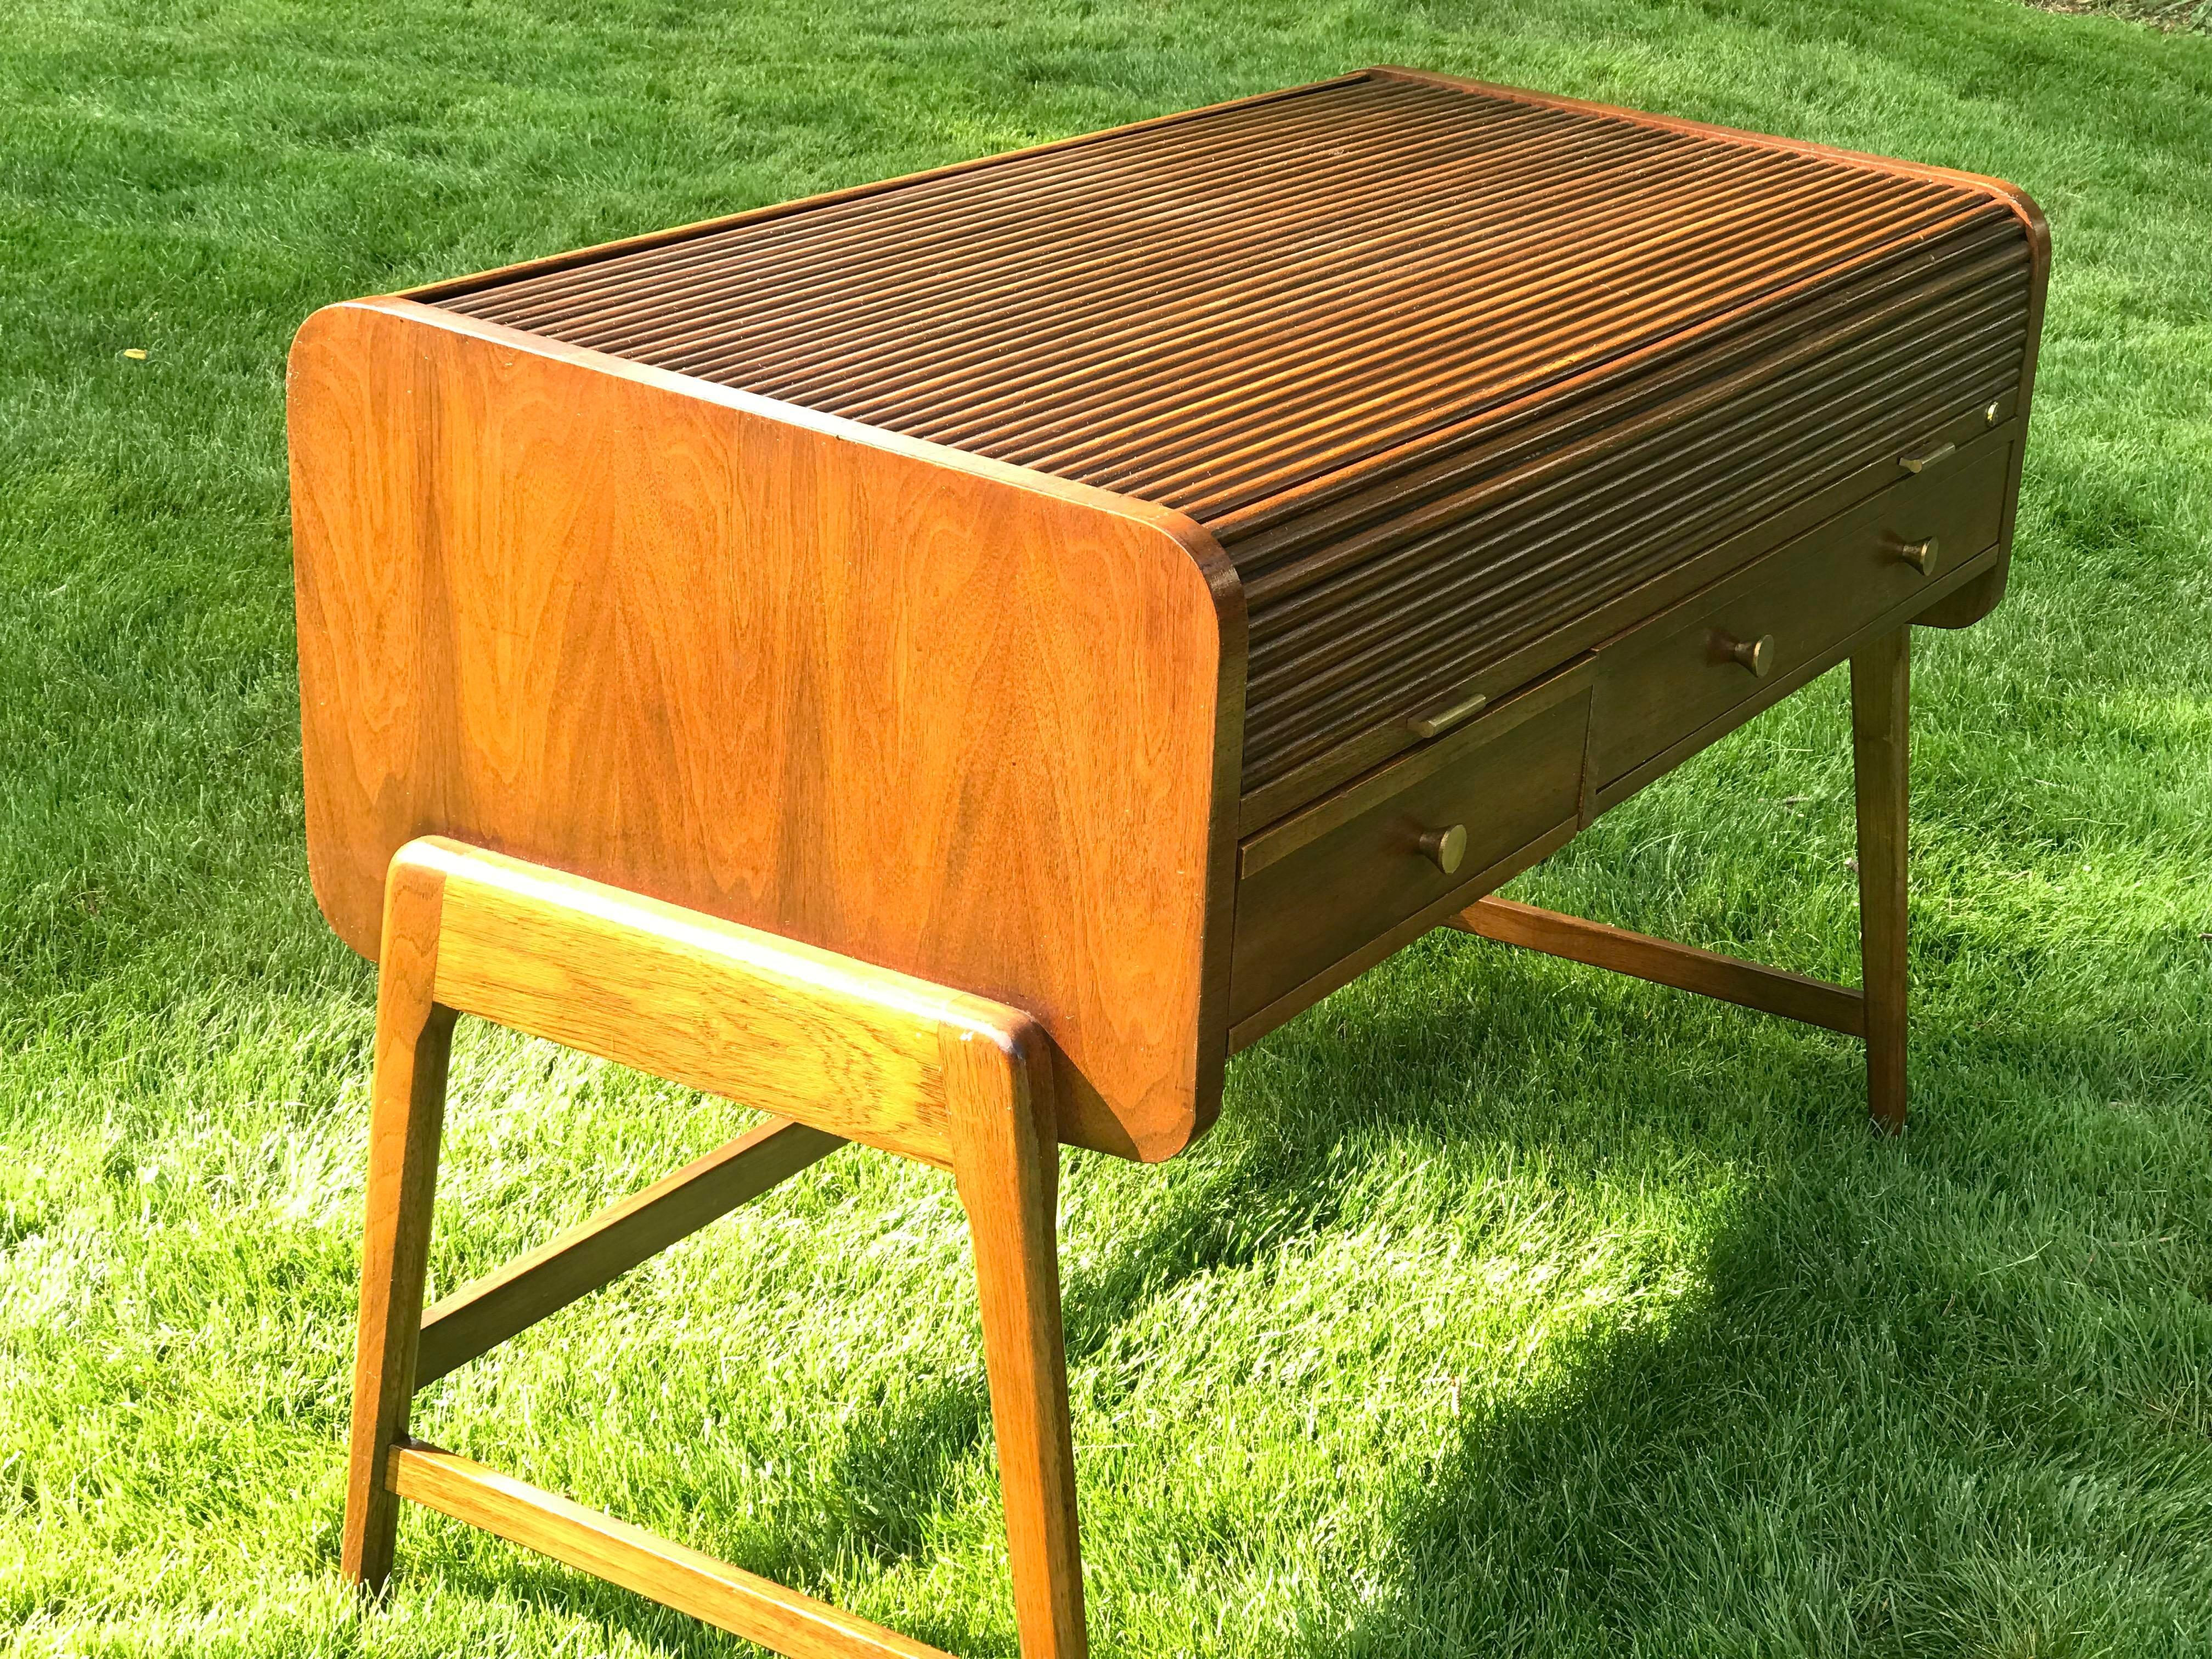 Sligh Lowry Furniture Co. 1960s Mid Century Modern Sligh Lowry Furniture  Tambour Roll